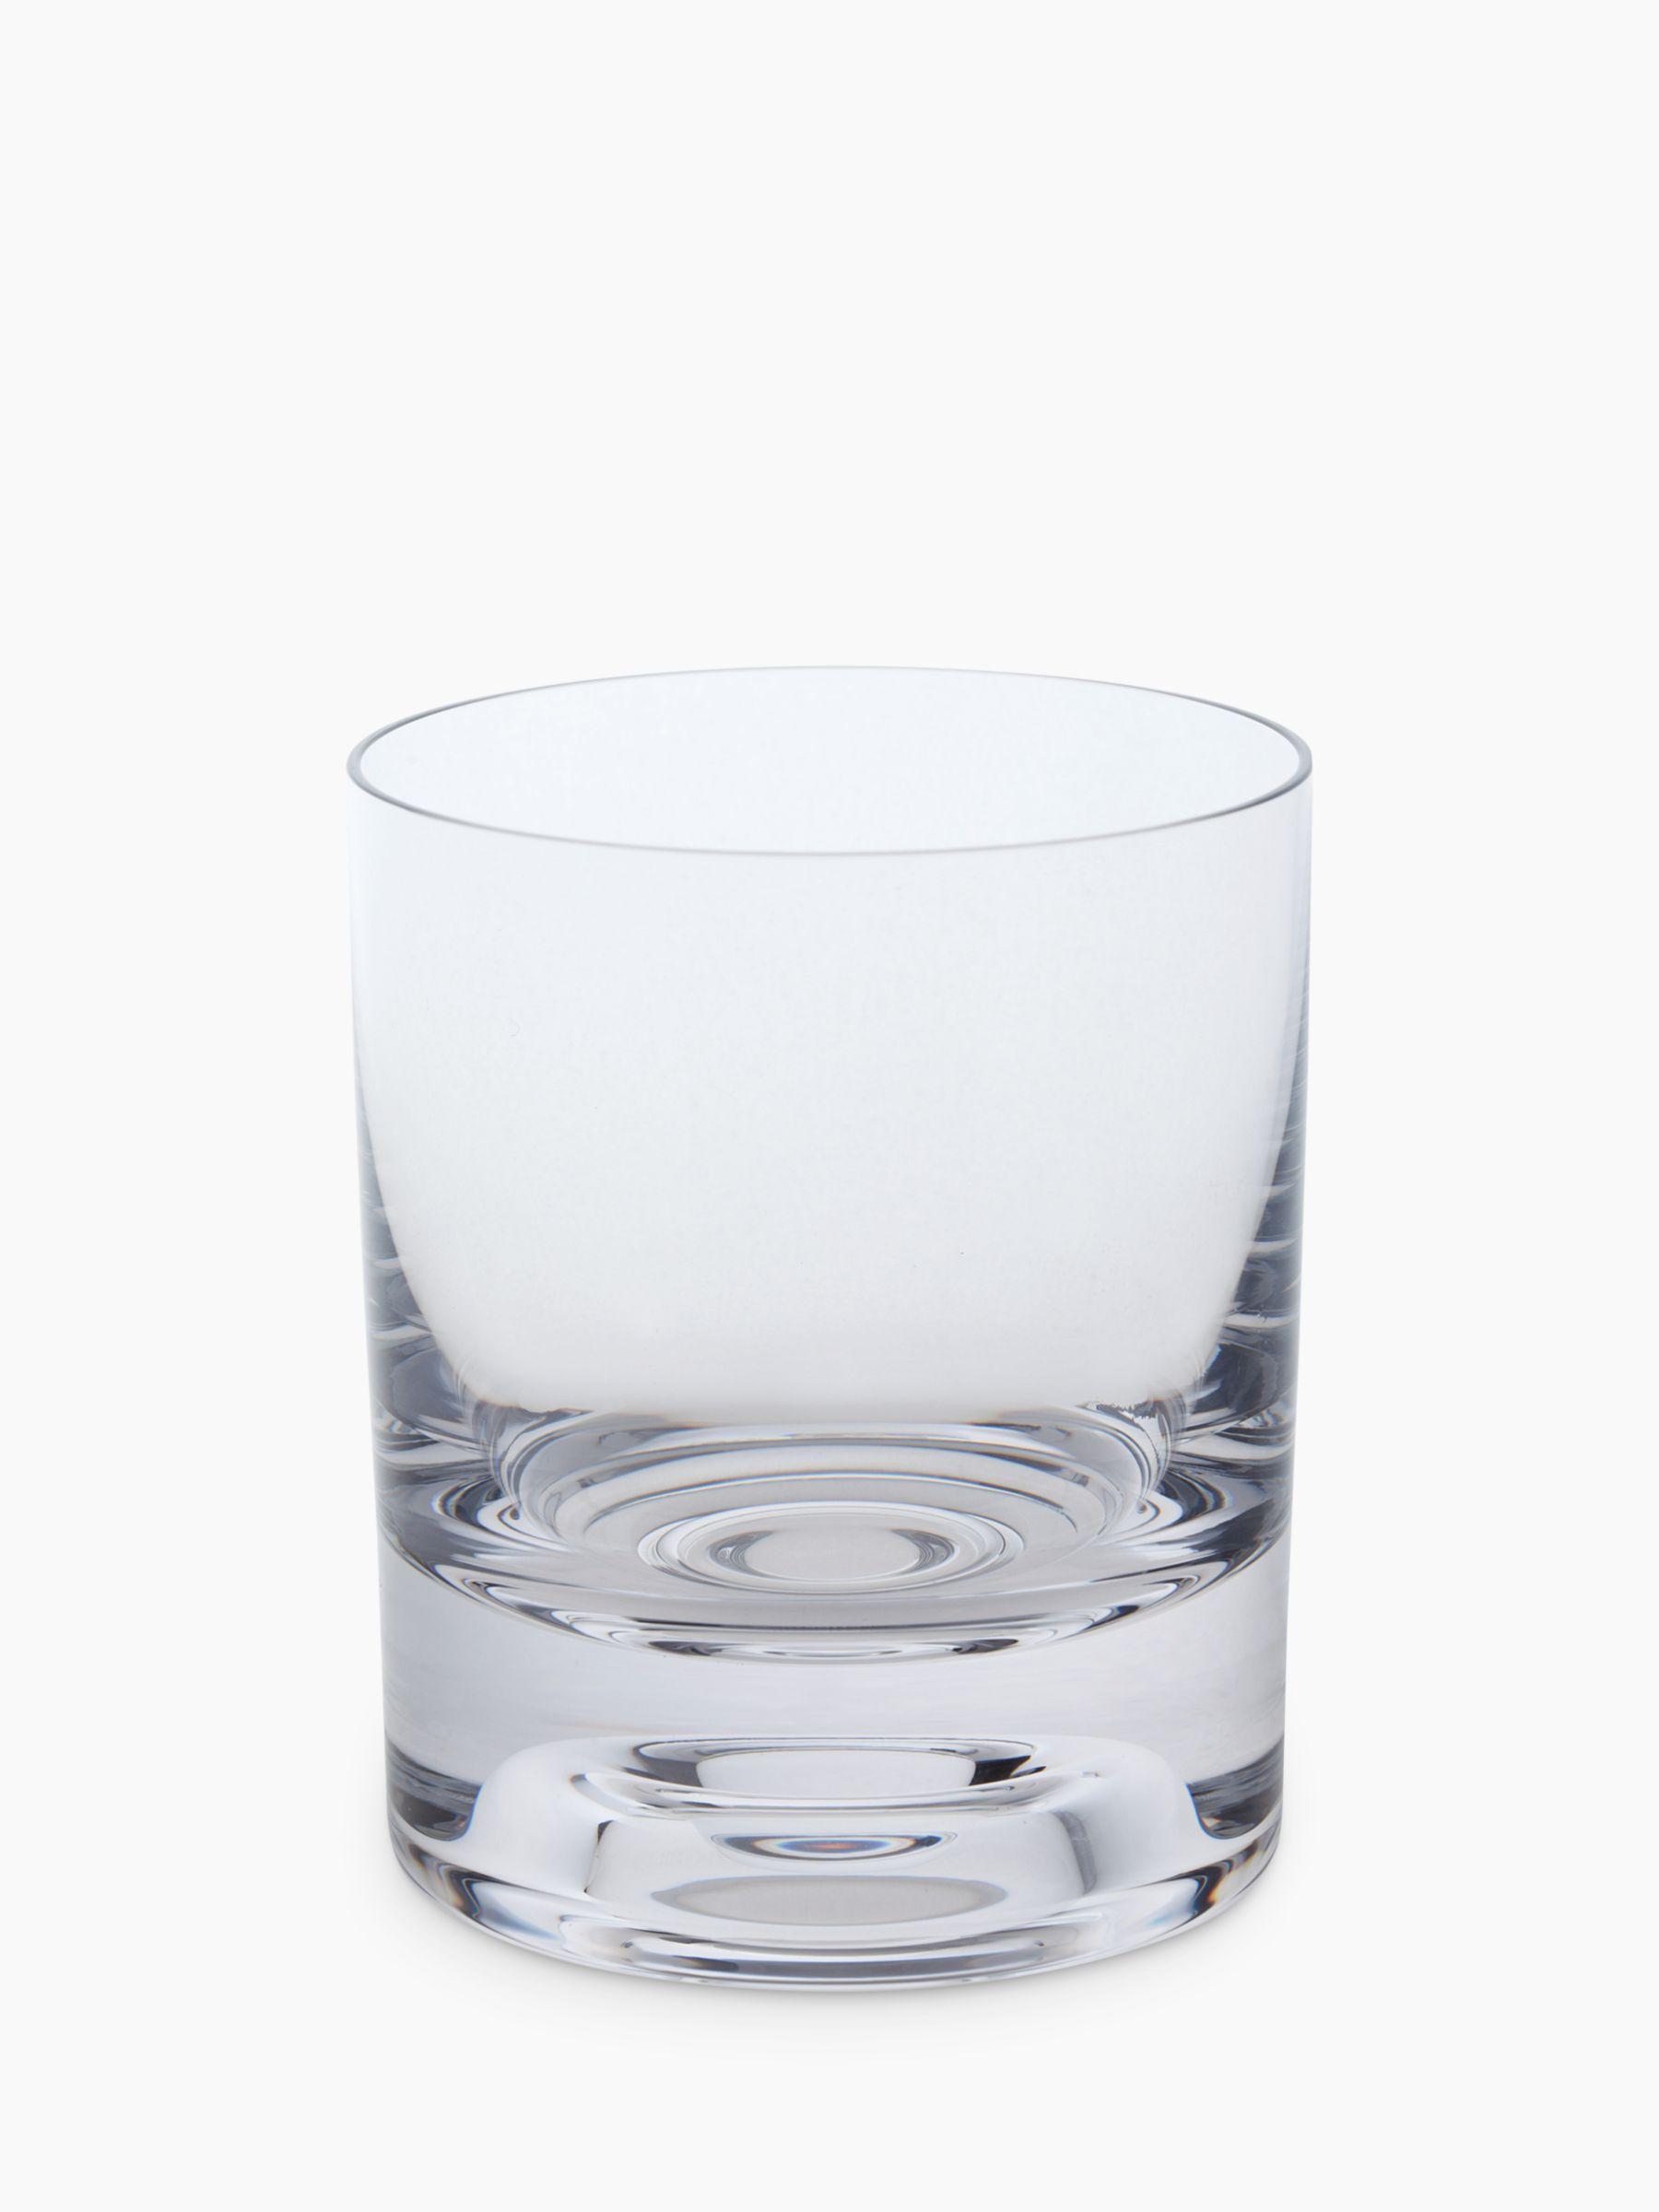 Dartington Crystal Dartington Crystal Circle Glass Tumblers, Set of 2, 215ml, Clear